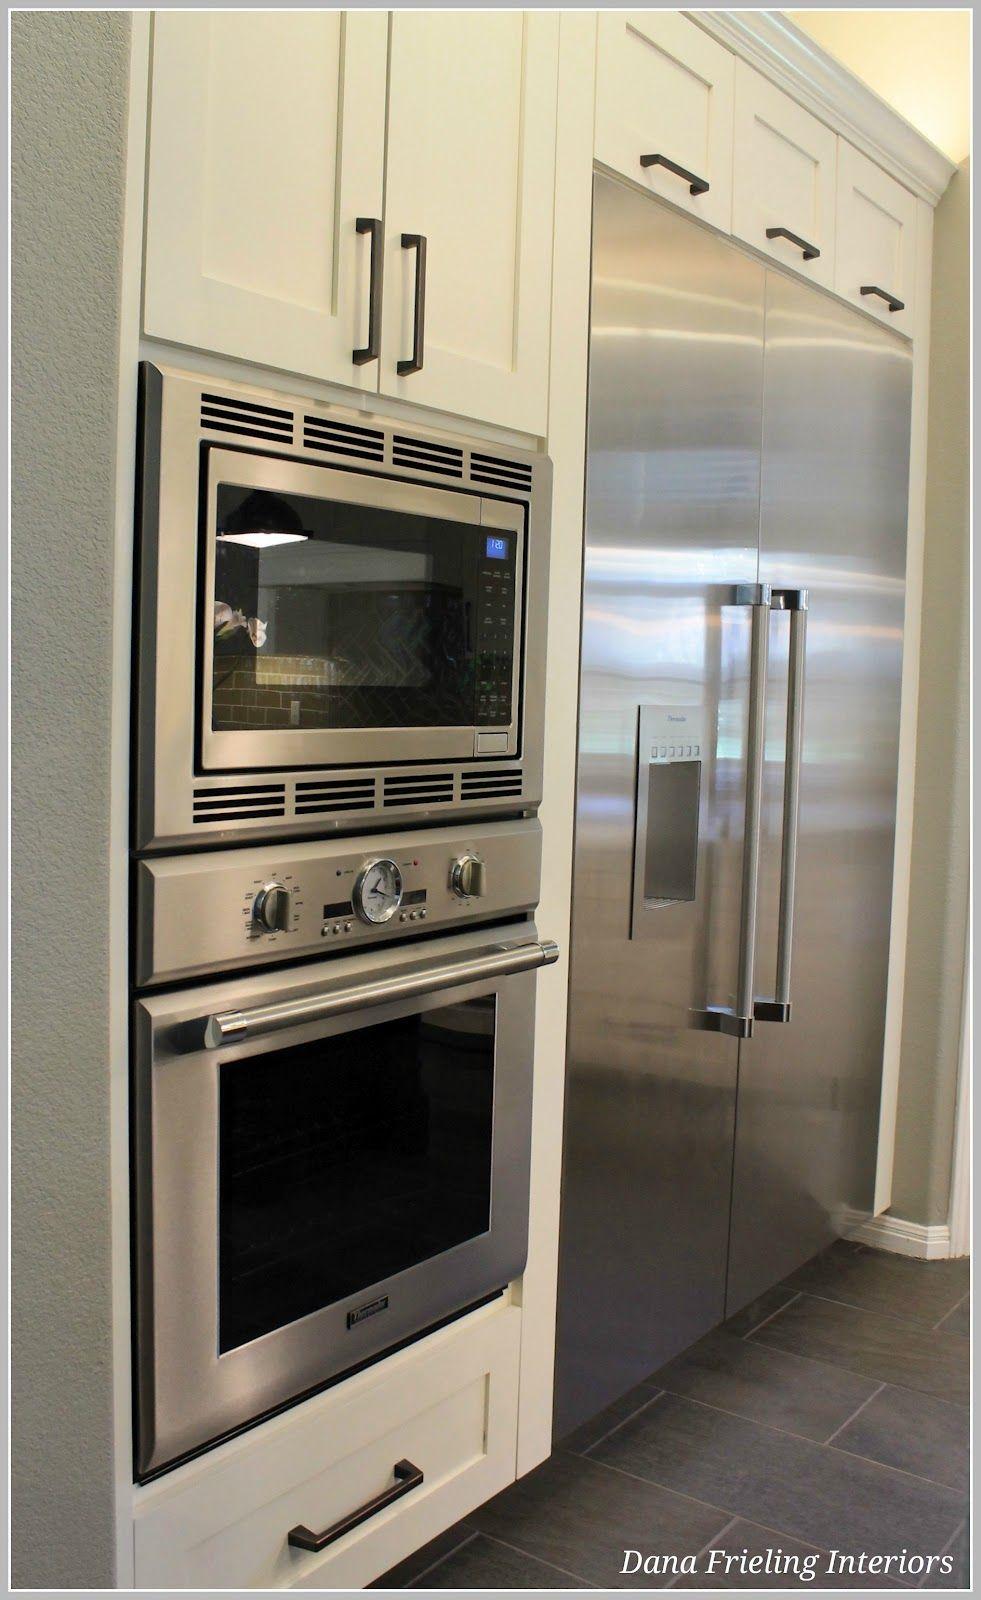 Appliances Full Sized Freezer Refrigerator Side By Side